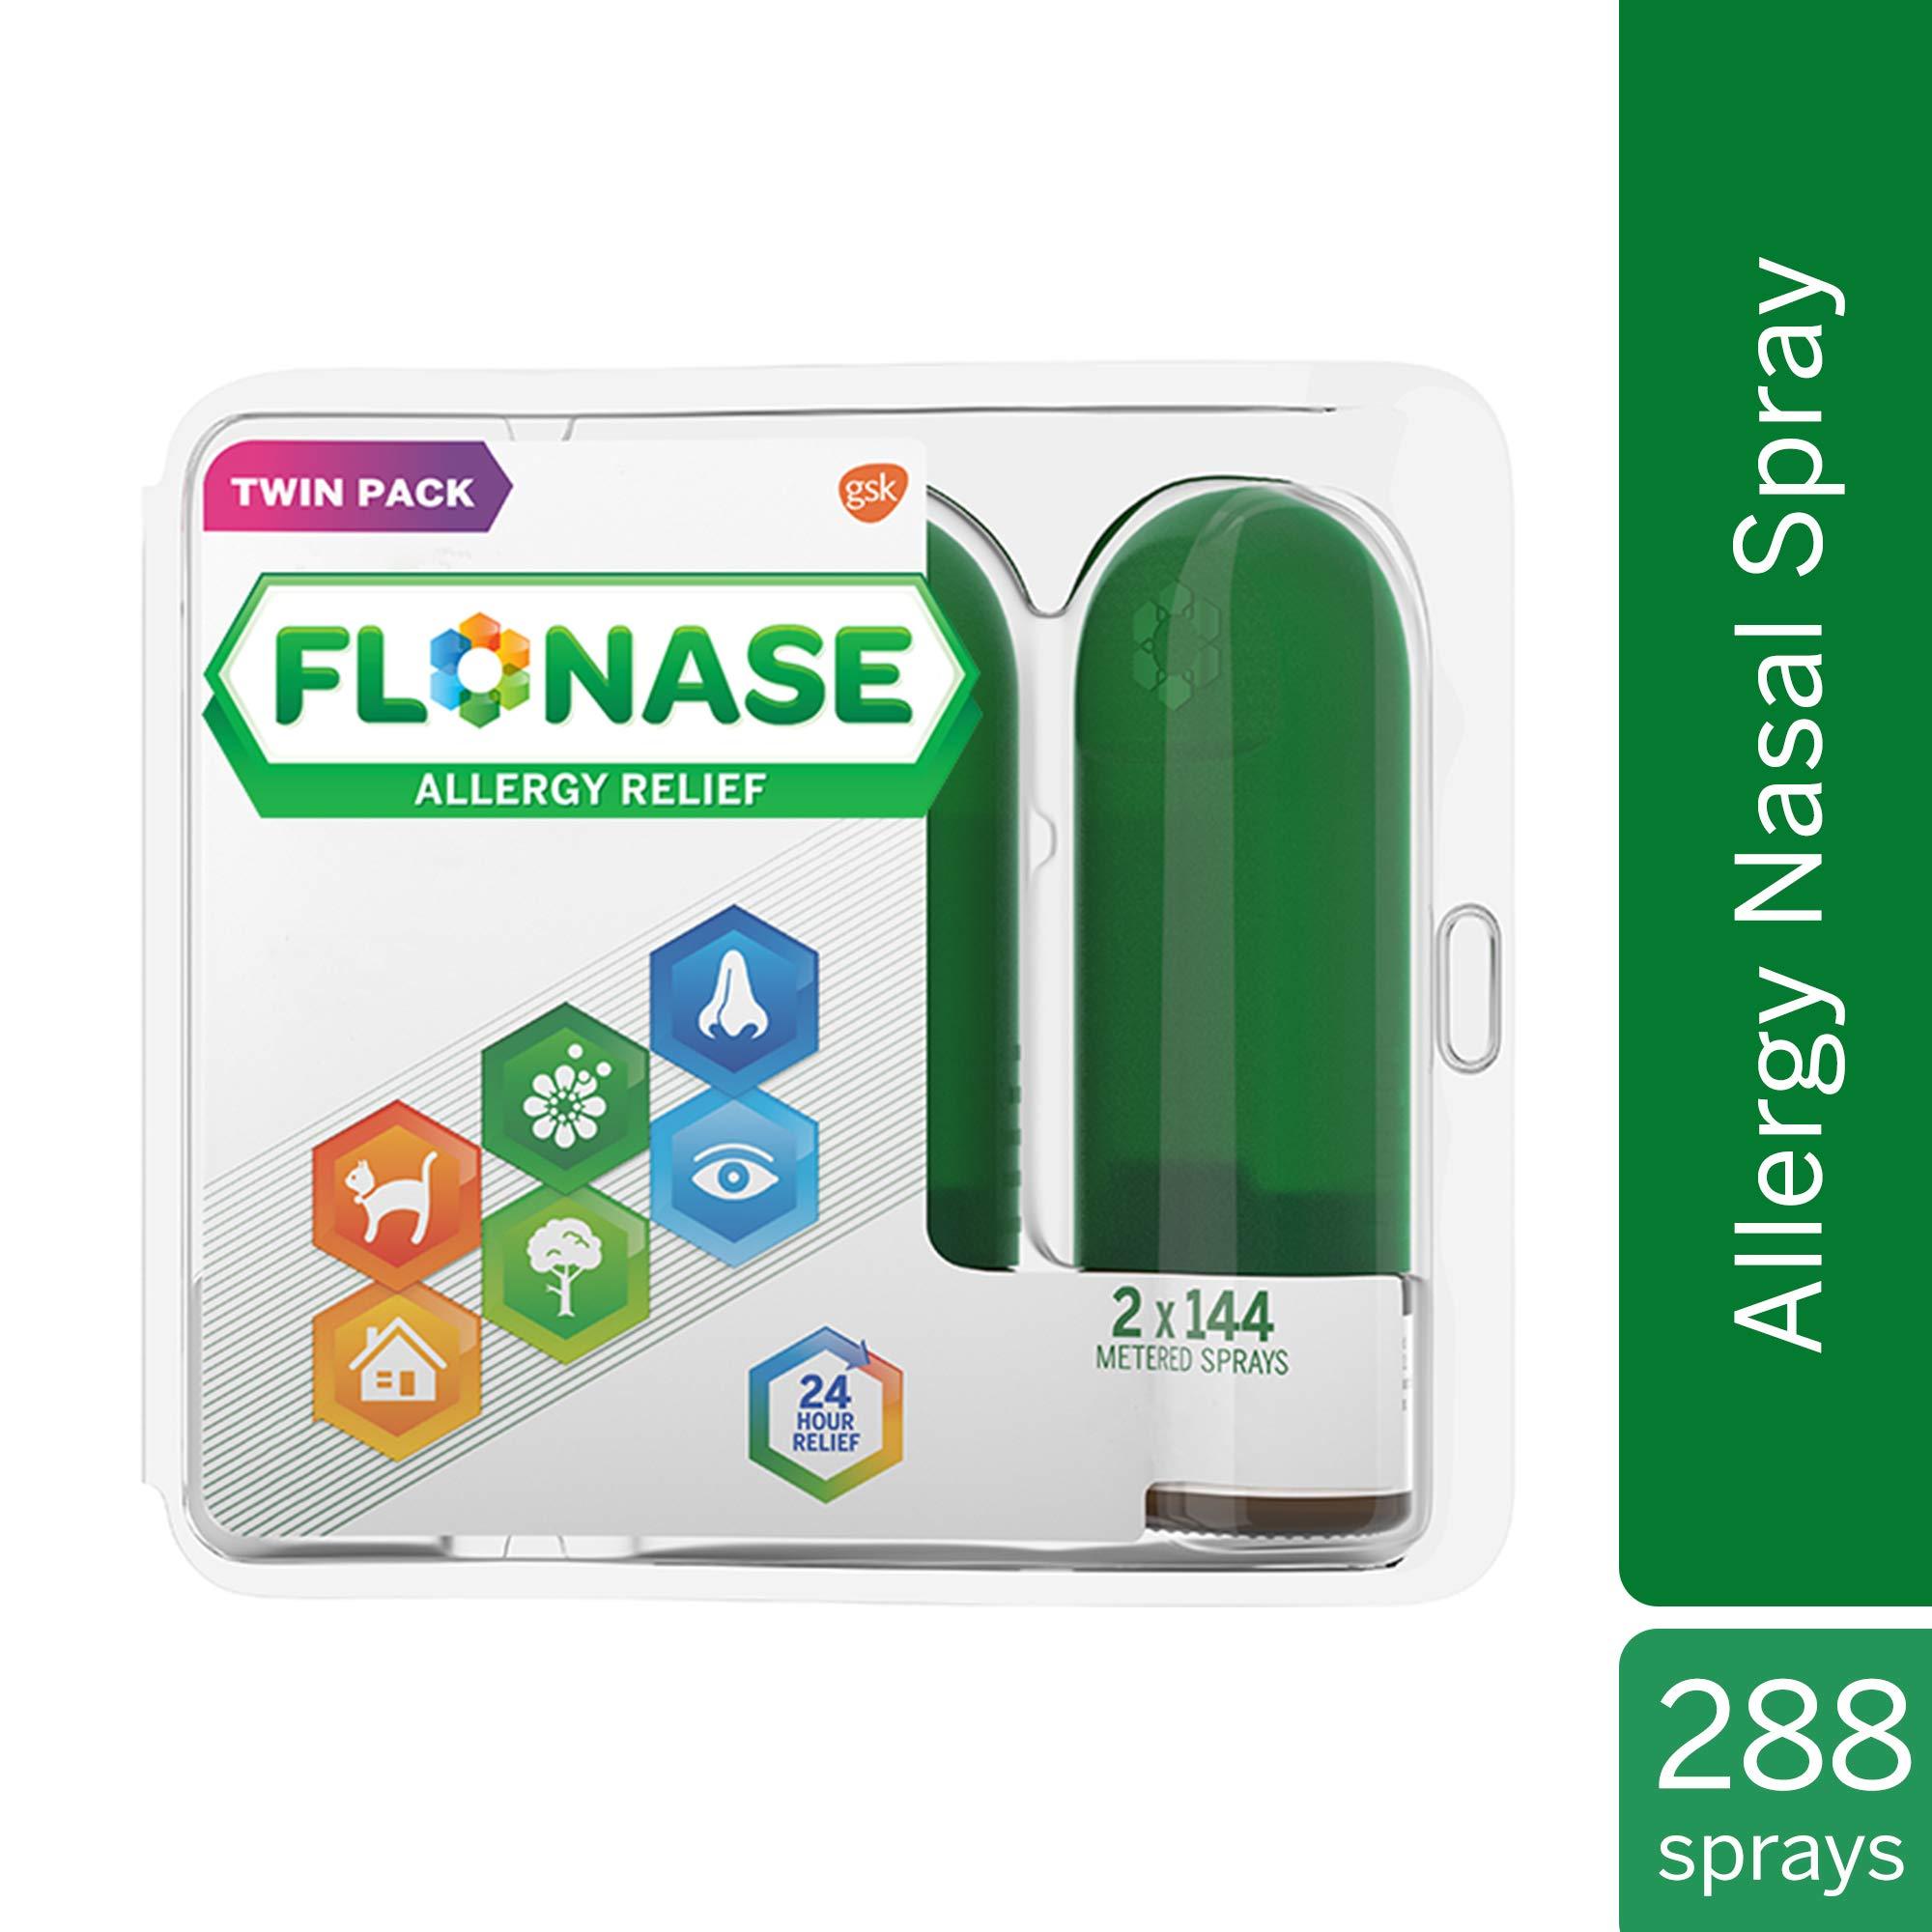 Flonase Allergy Relief Nasal Spray, Allergy Medicine 24 Hour Non-Drowsy , 288 sprays (pack of 2) by Flonase